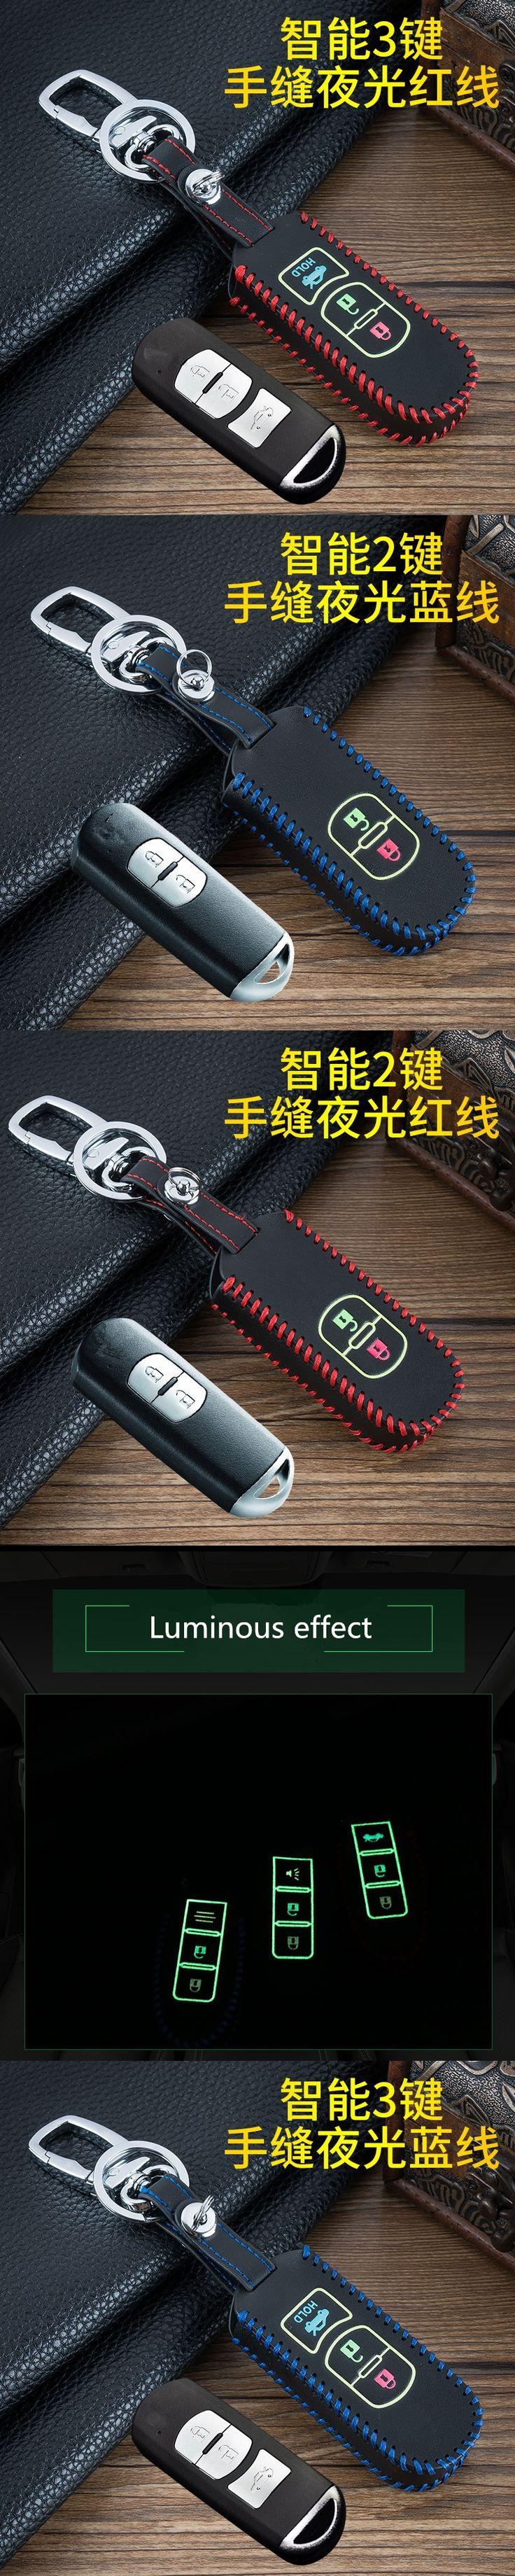 keychain Car Luminous Leather Key Chain Case Cover For Mazda 3 2 5 / Mazda 6 Axela CX-3 CX-5 CX5 CX7 CX-7 CX-9 RX8 Car Style